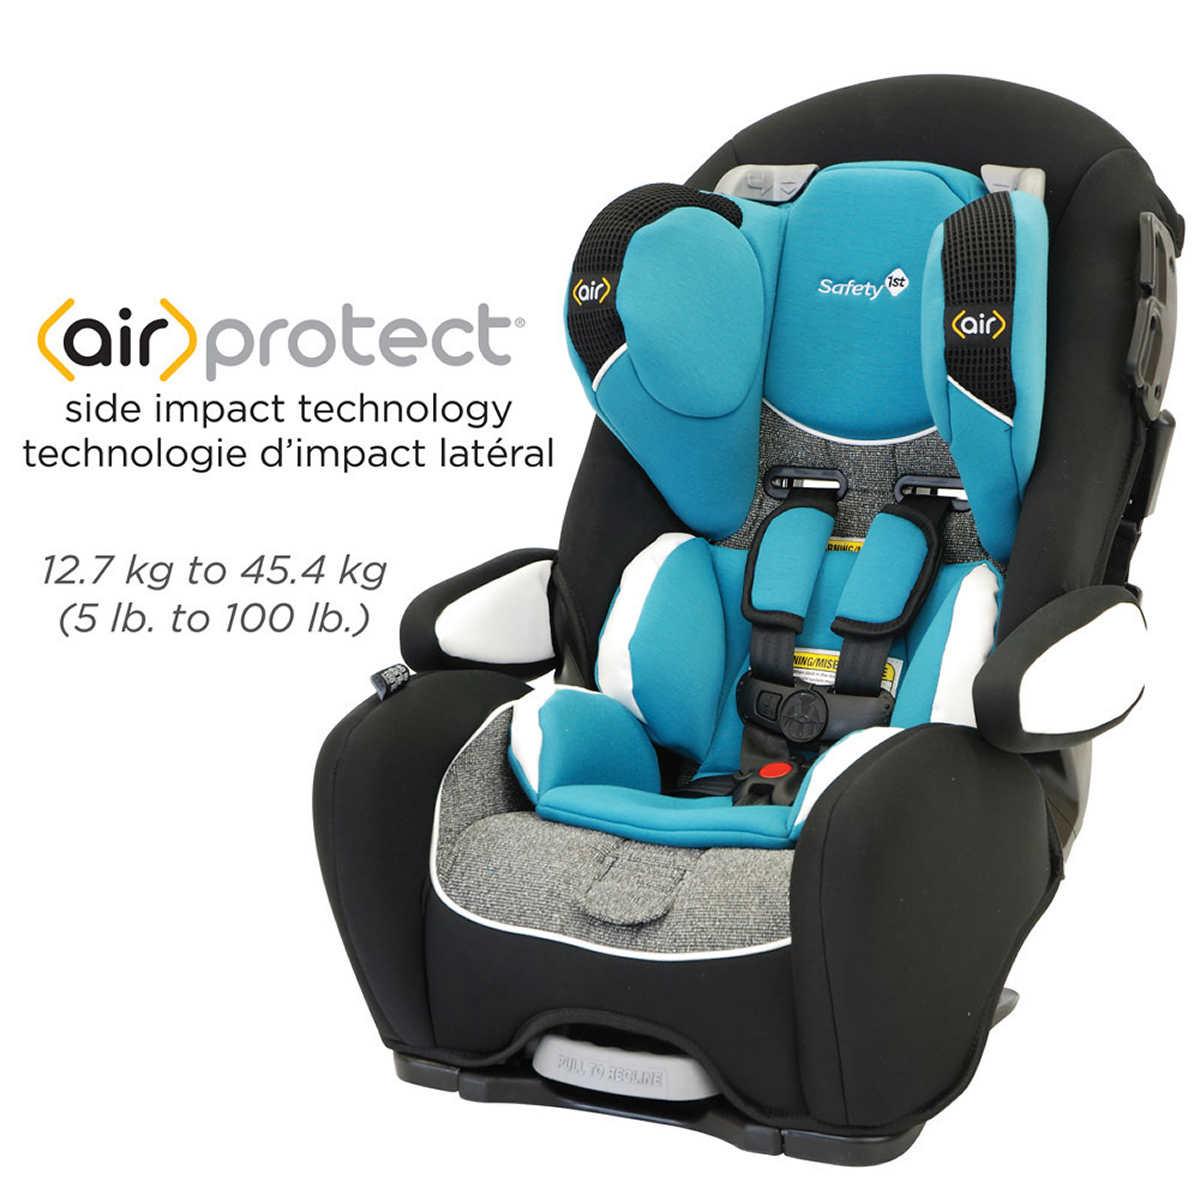 Safety 1st alpha omega elite air akron